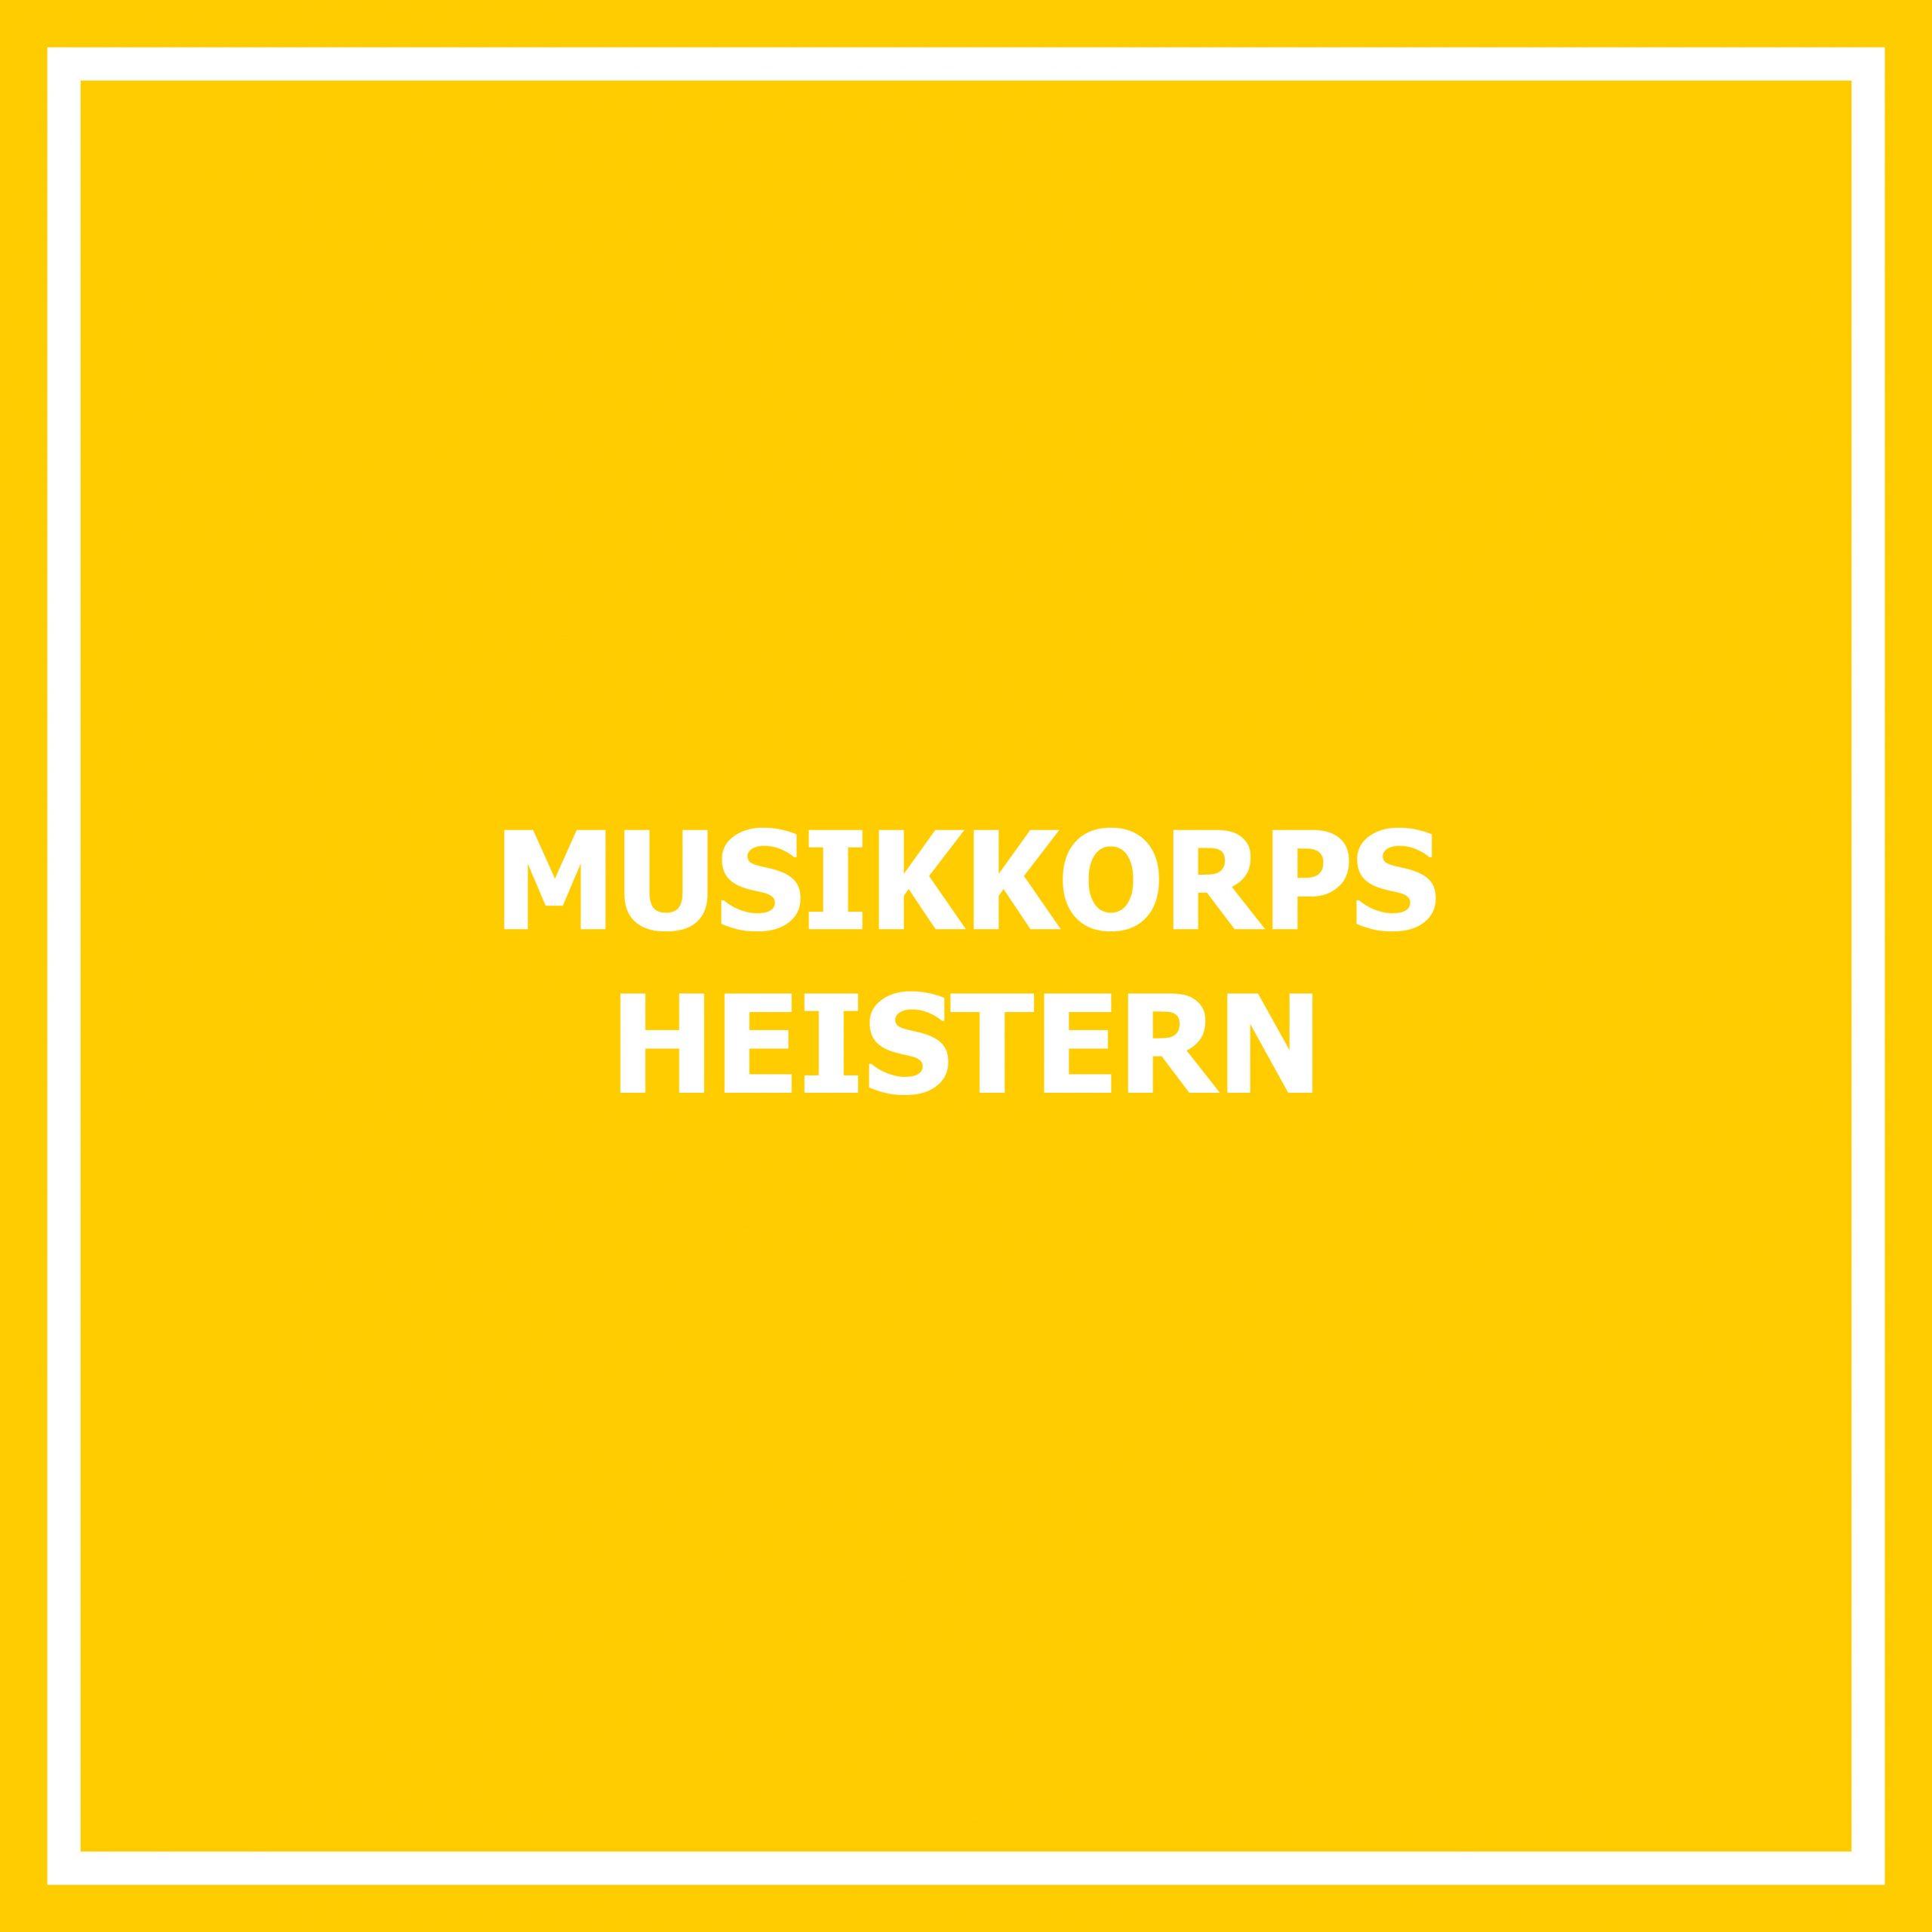 Musikkorps Heistern